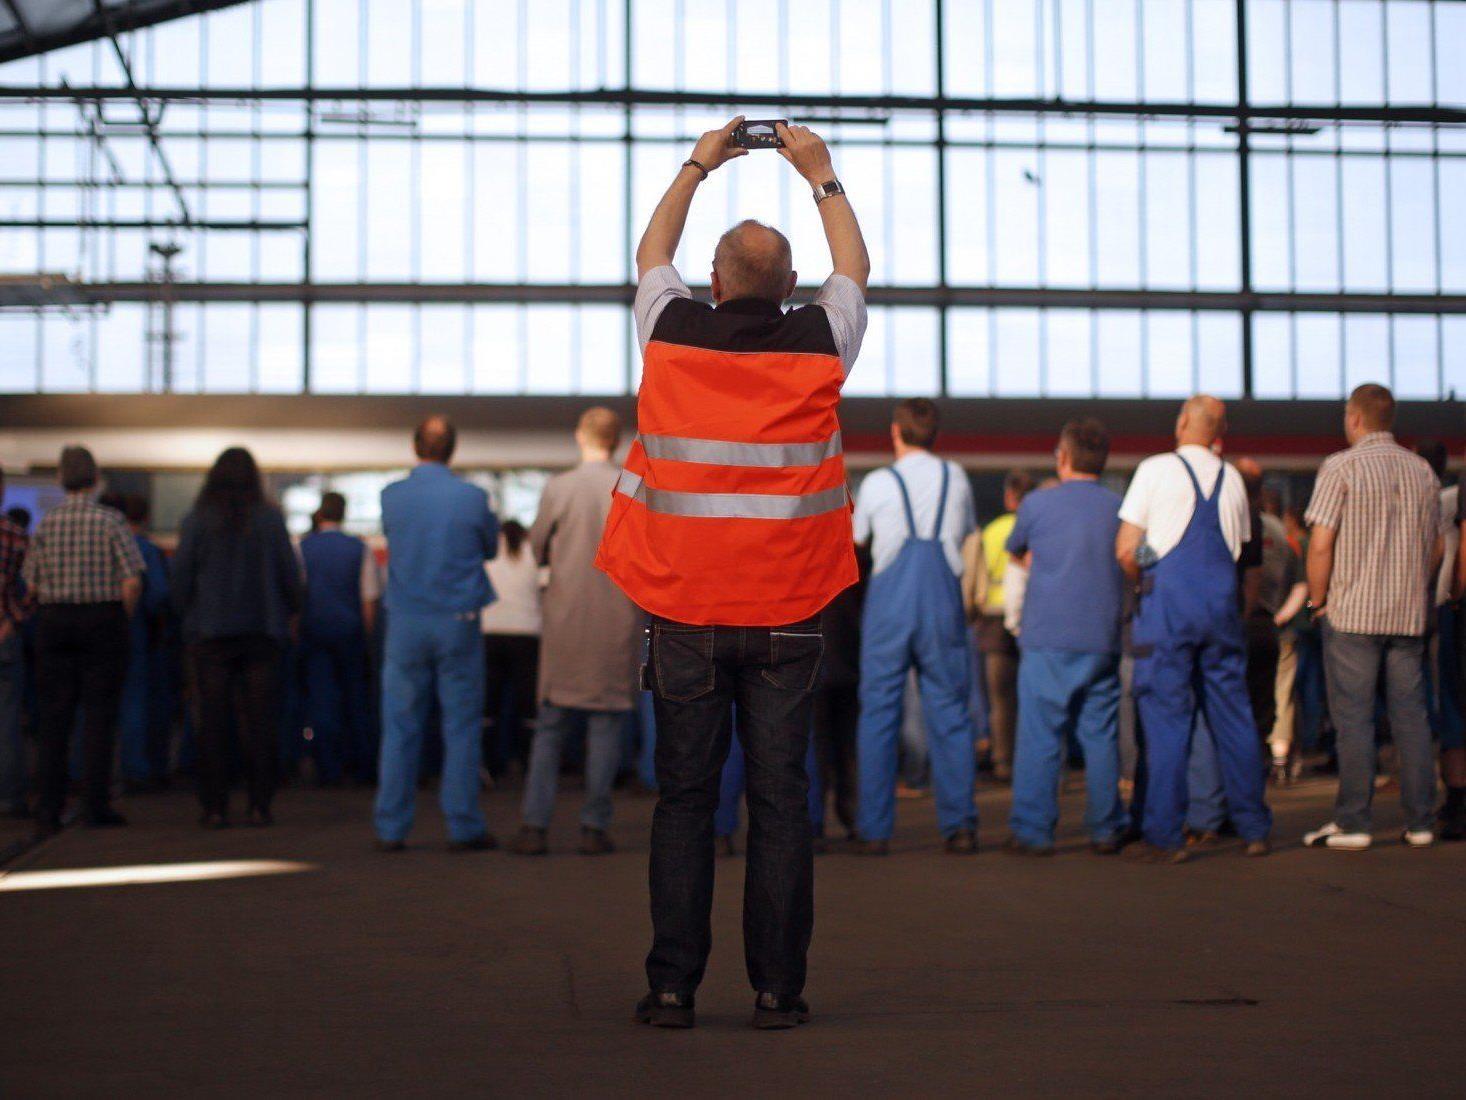 Eisenbahner-Proteste laufen ohne Eskalation ab